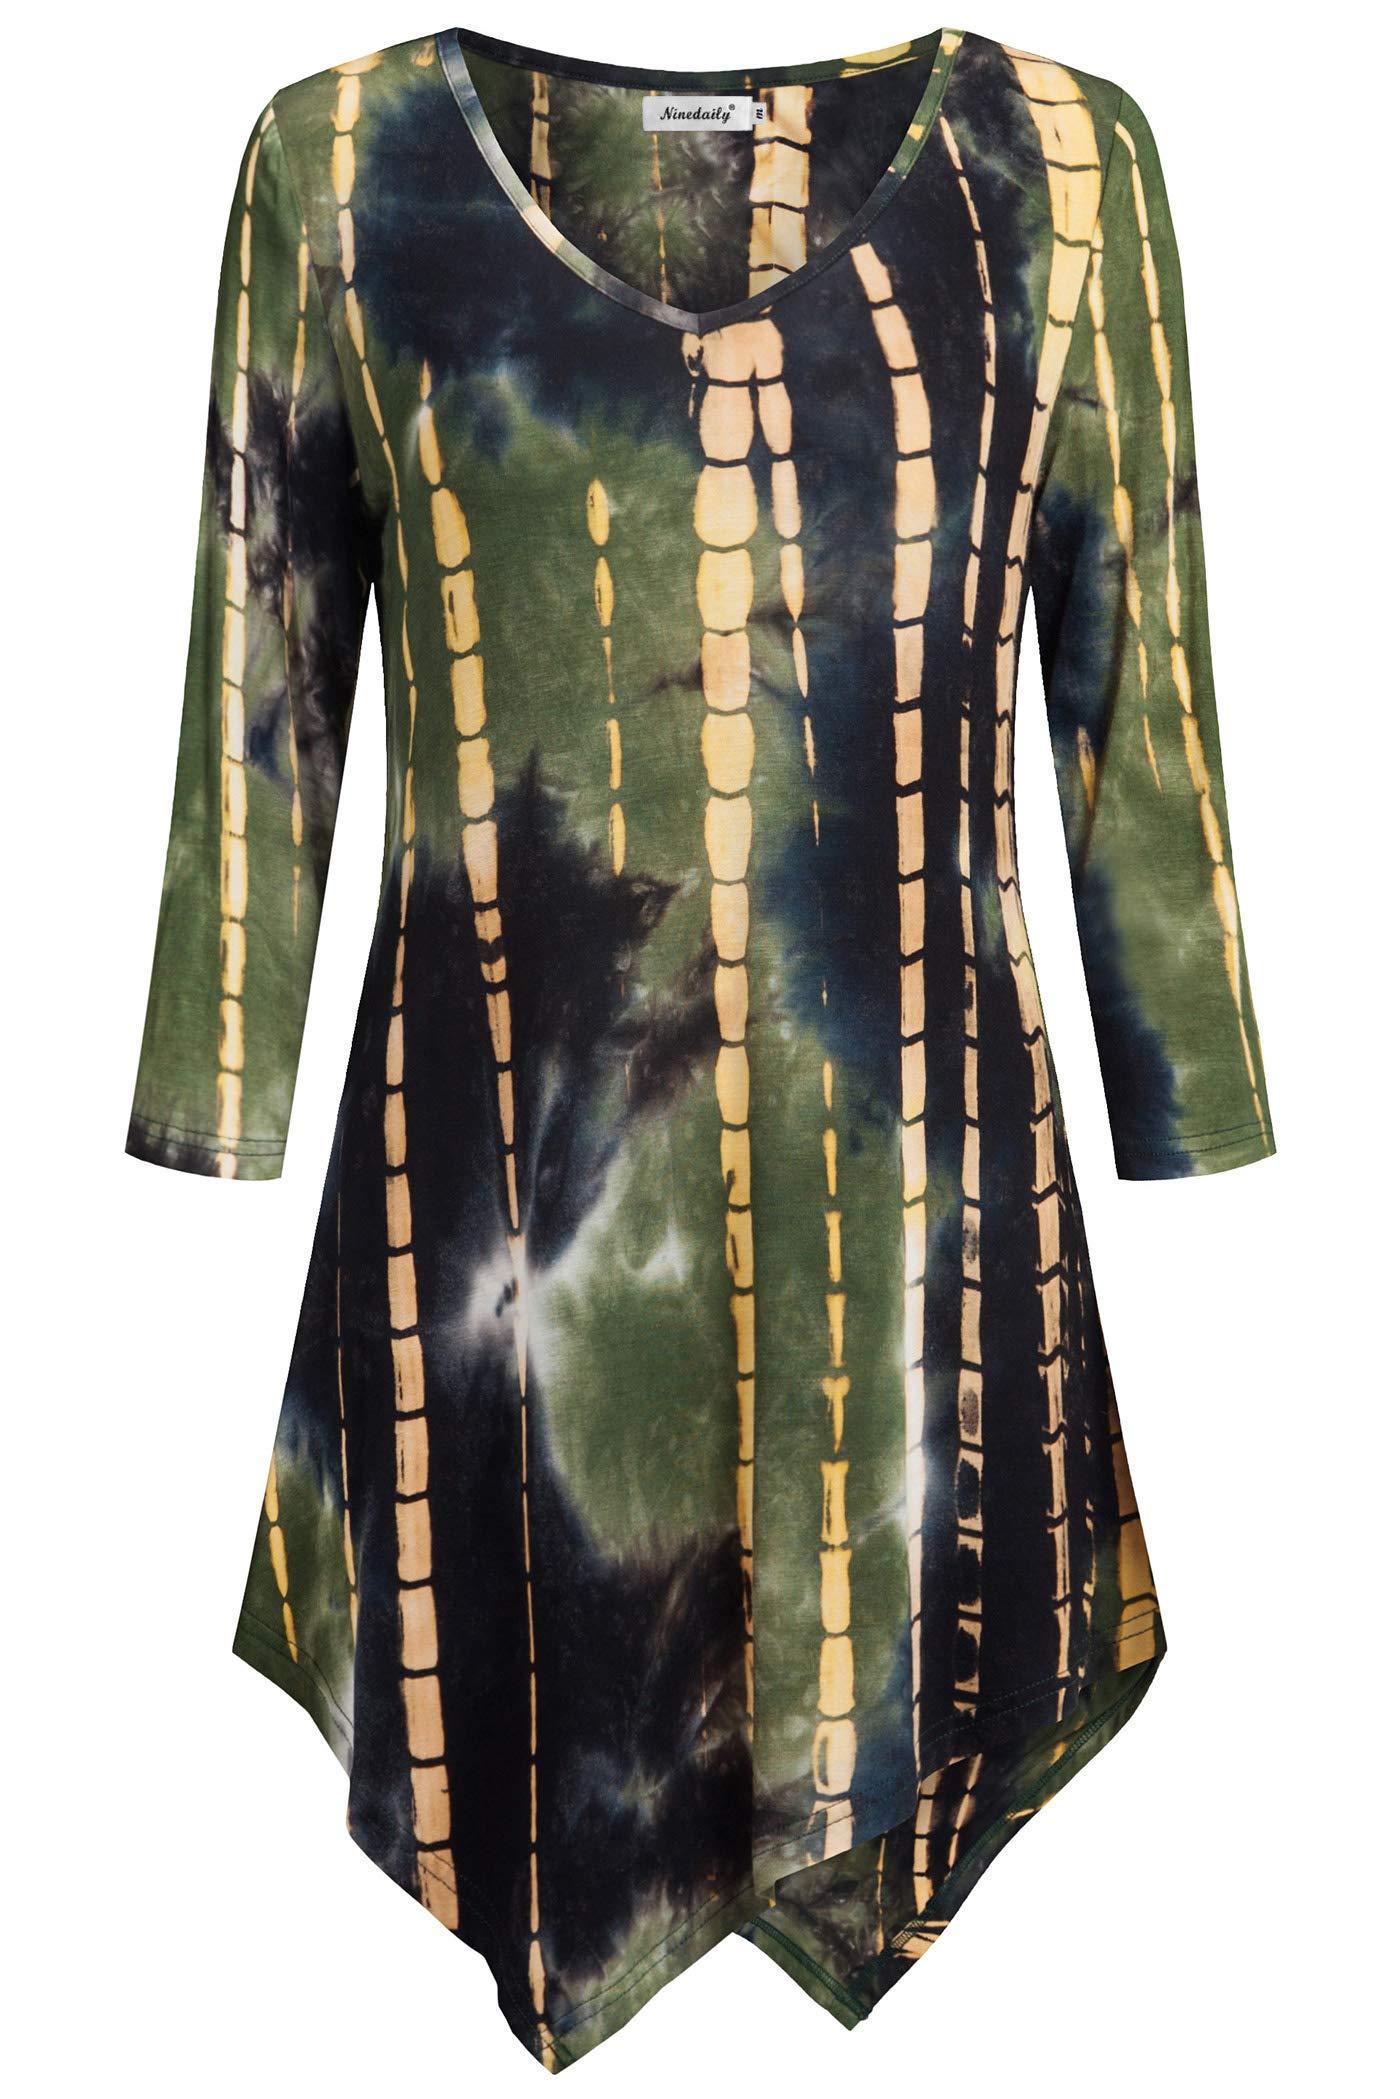 Ninedaily Long Tunic Tops for Women, Boho Style Denim Peasant Blouse Business Asymmetrical Hem Office Apparel Trendy Clothing 2018 XL Womens Tops ArmyGreen